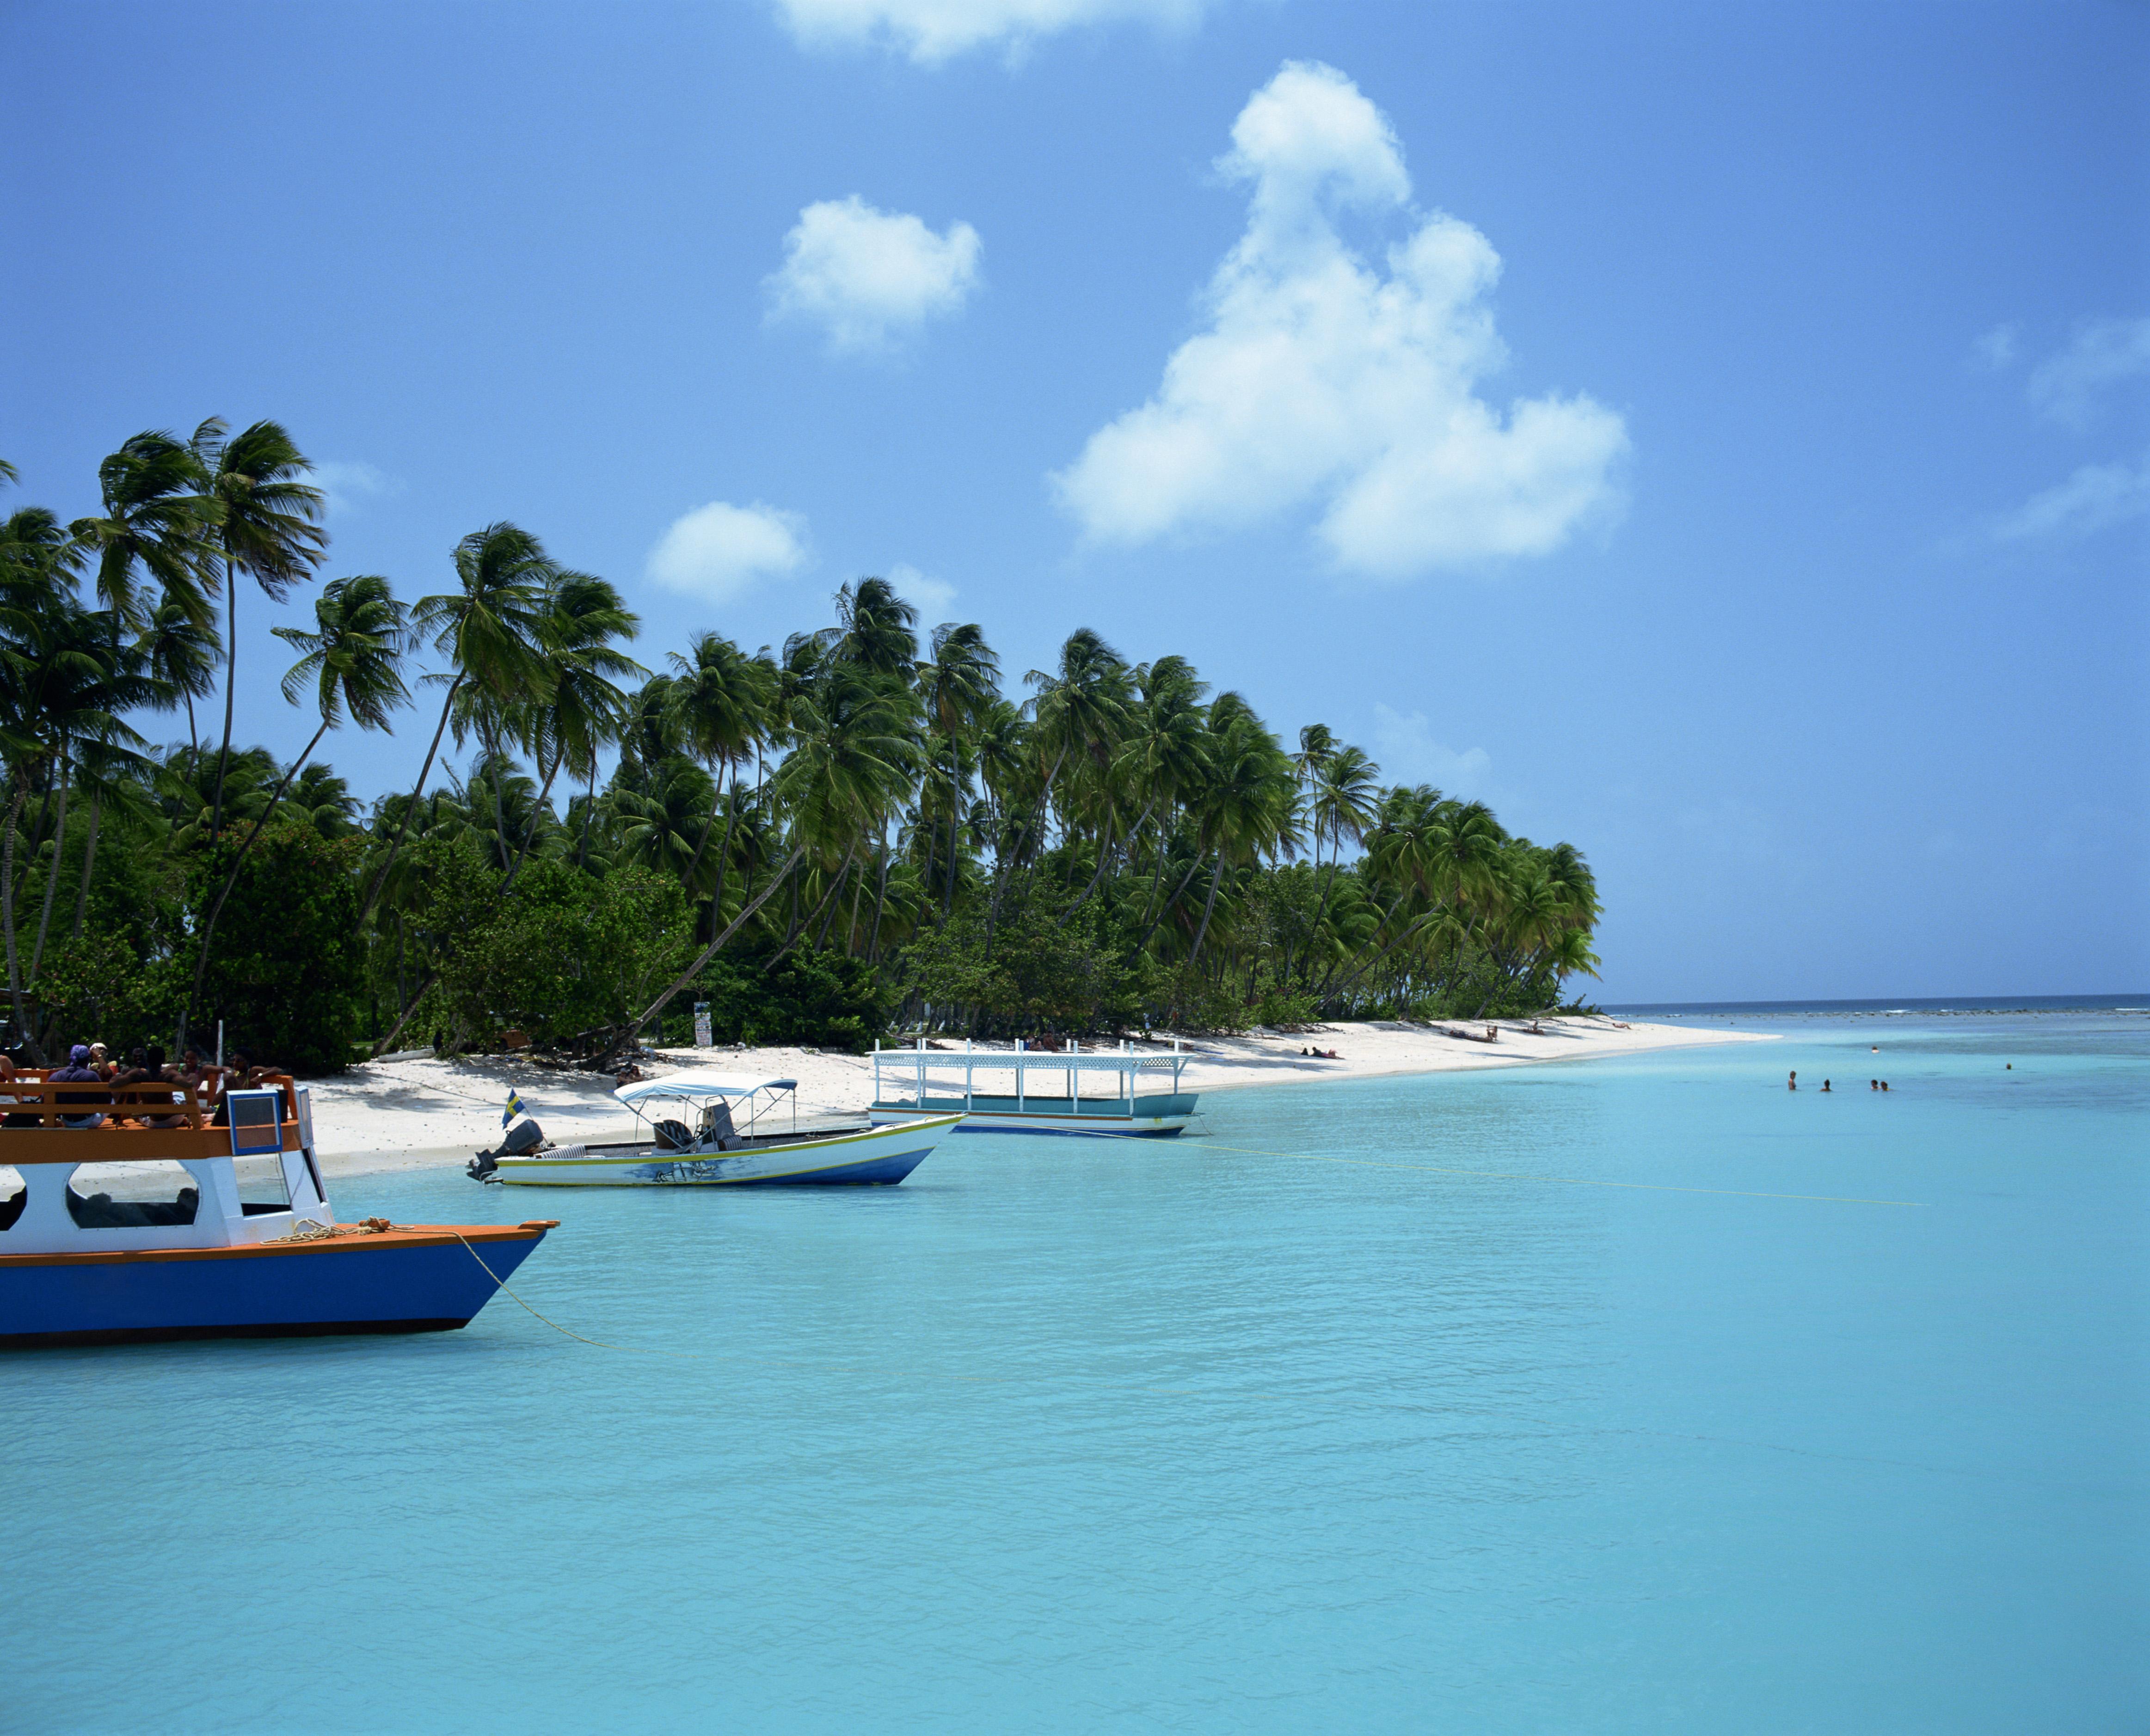 Boats moored at Pigeon Point, Trinidad